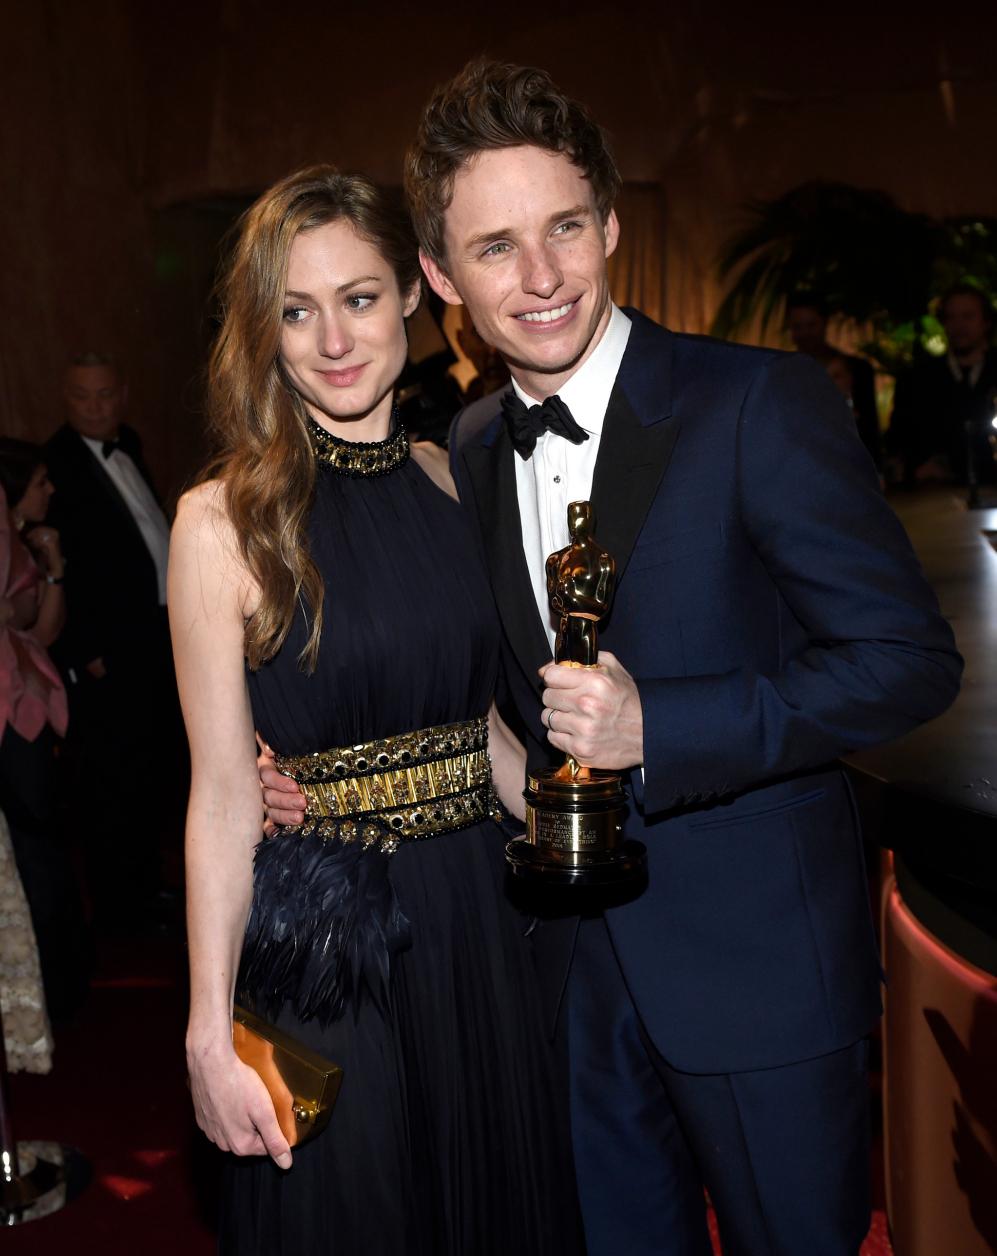 Guapos y sonrientes Hannah Bagshawe y Eddie Redmayne, ganador al Oscar...